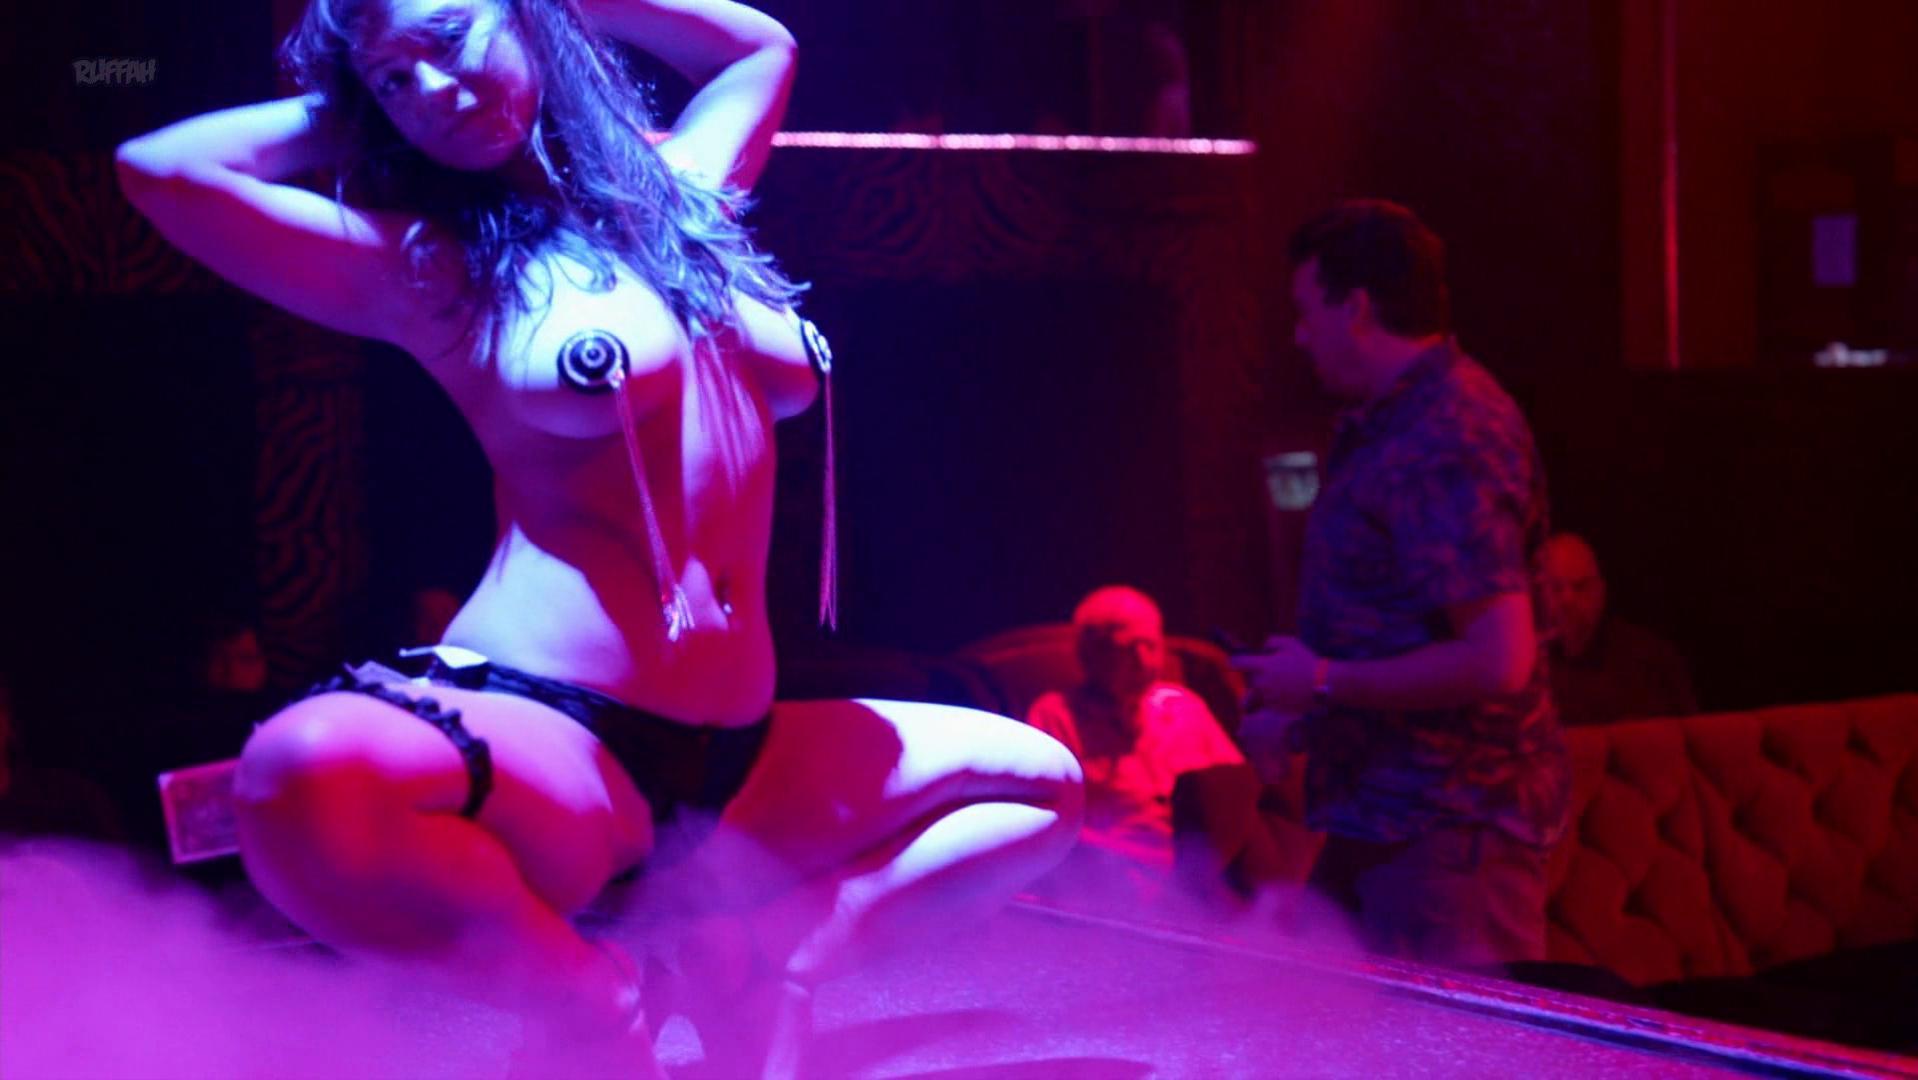 Mariann Gavelo nude - Vice Principals s02e07 (2017)